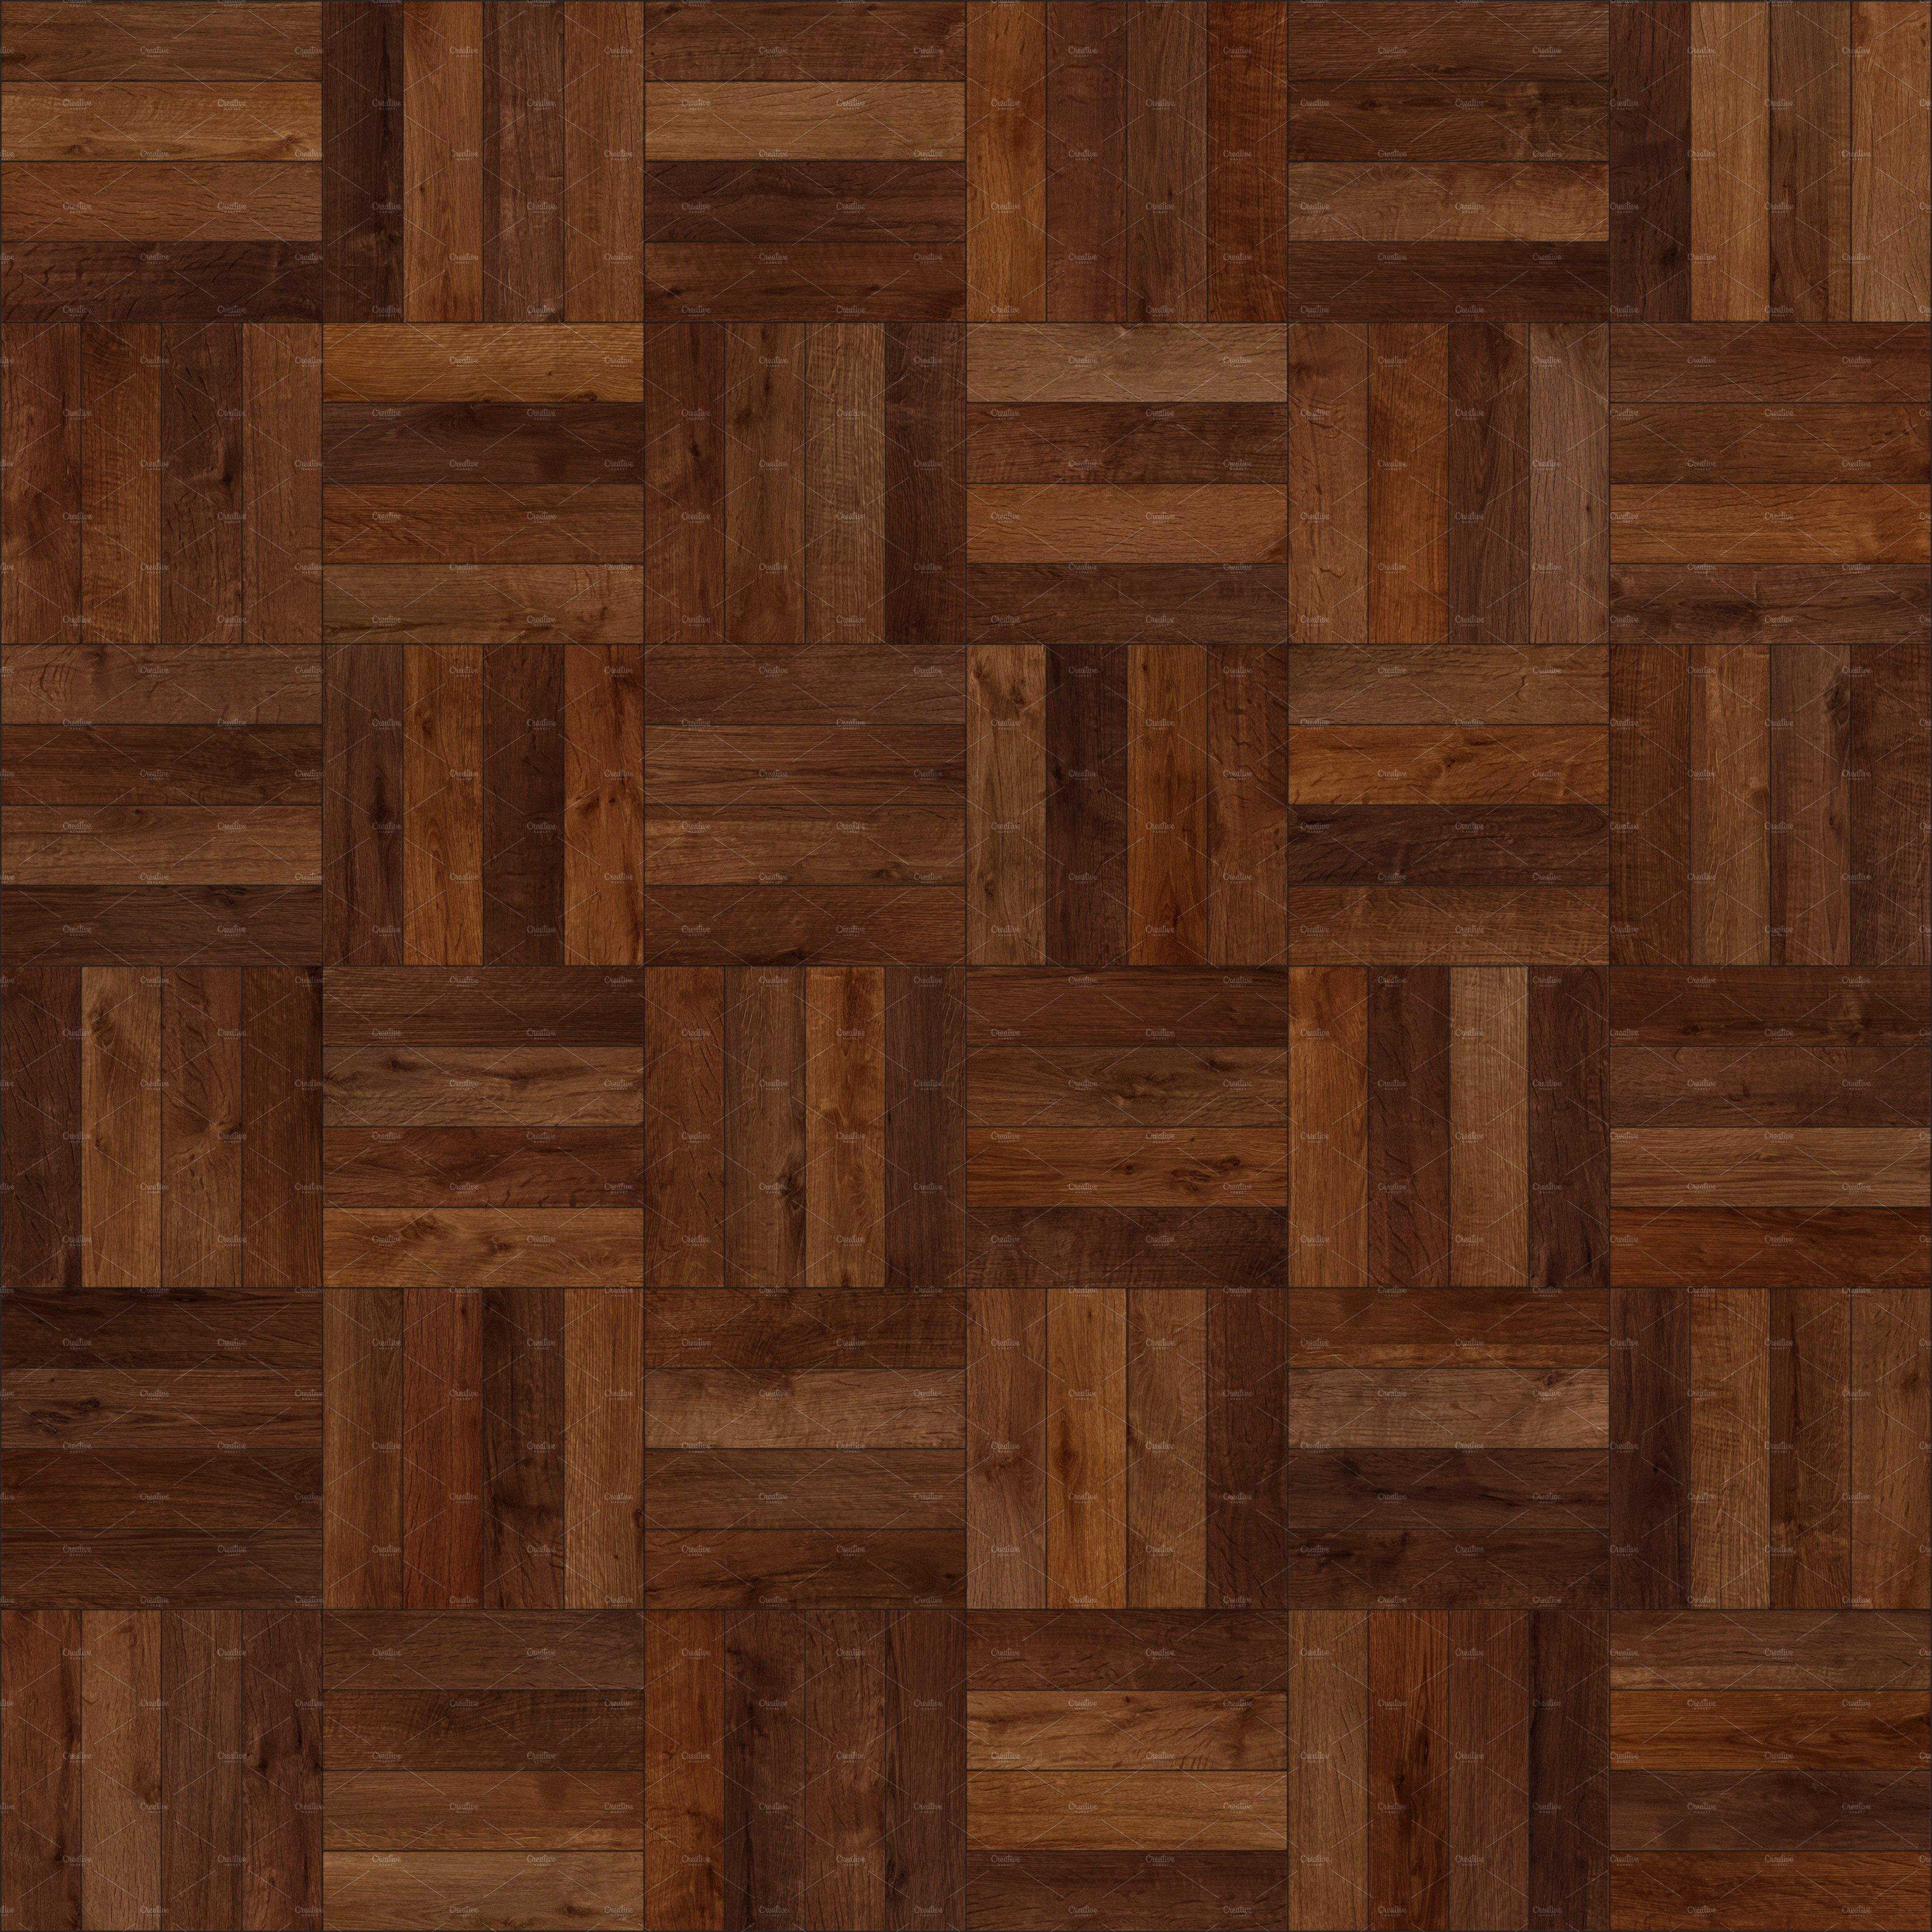 flooring market wood texture textures creative parquet seamless floor